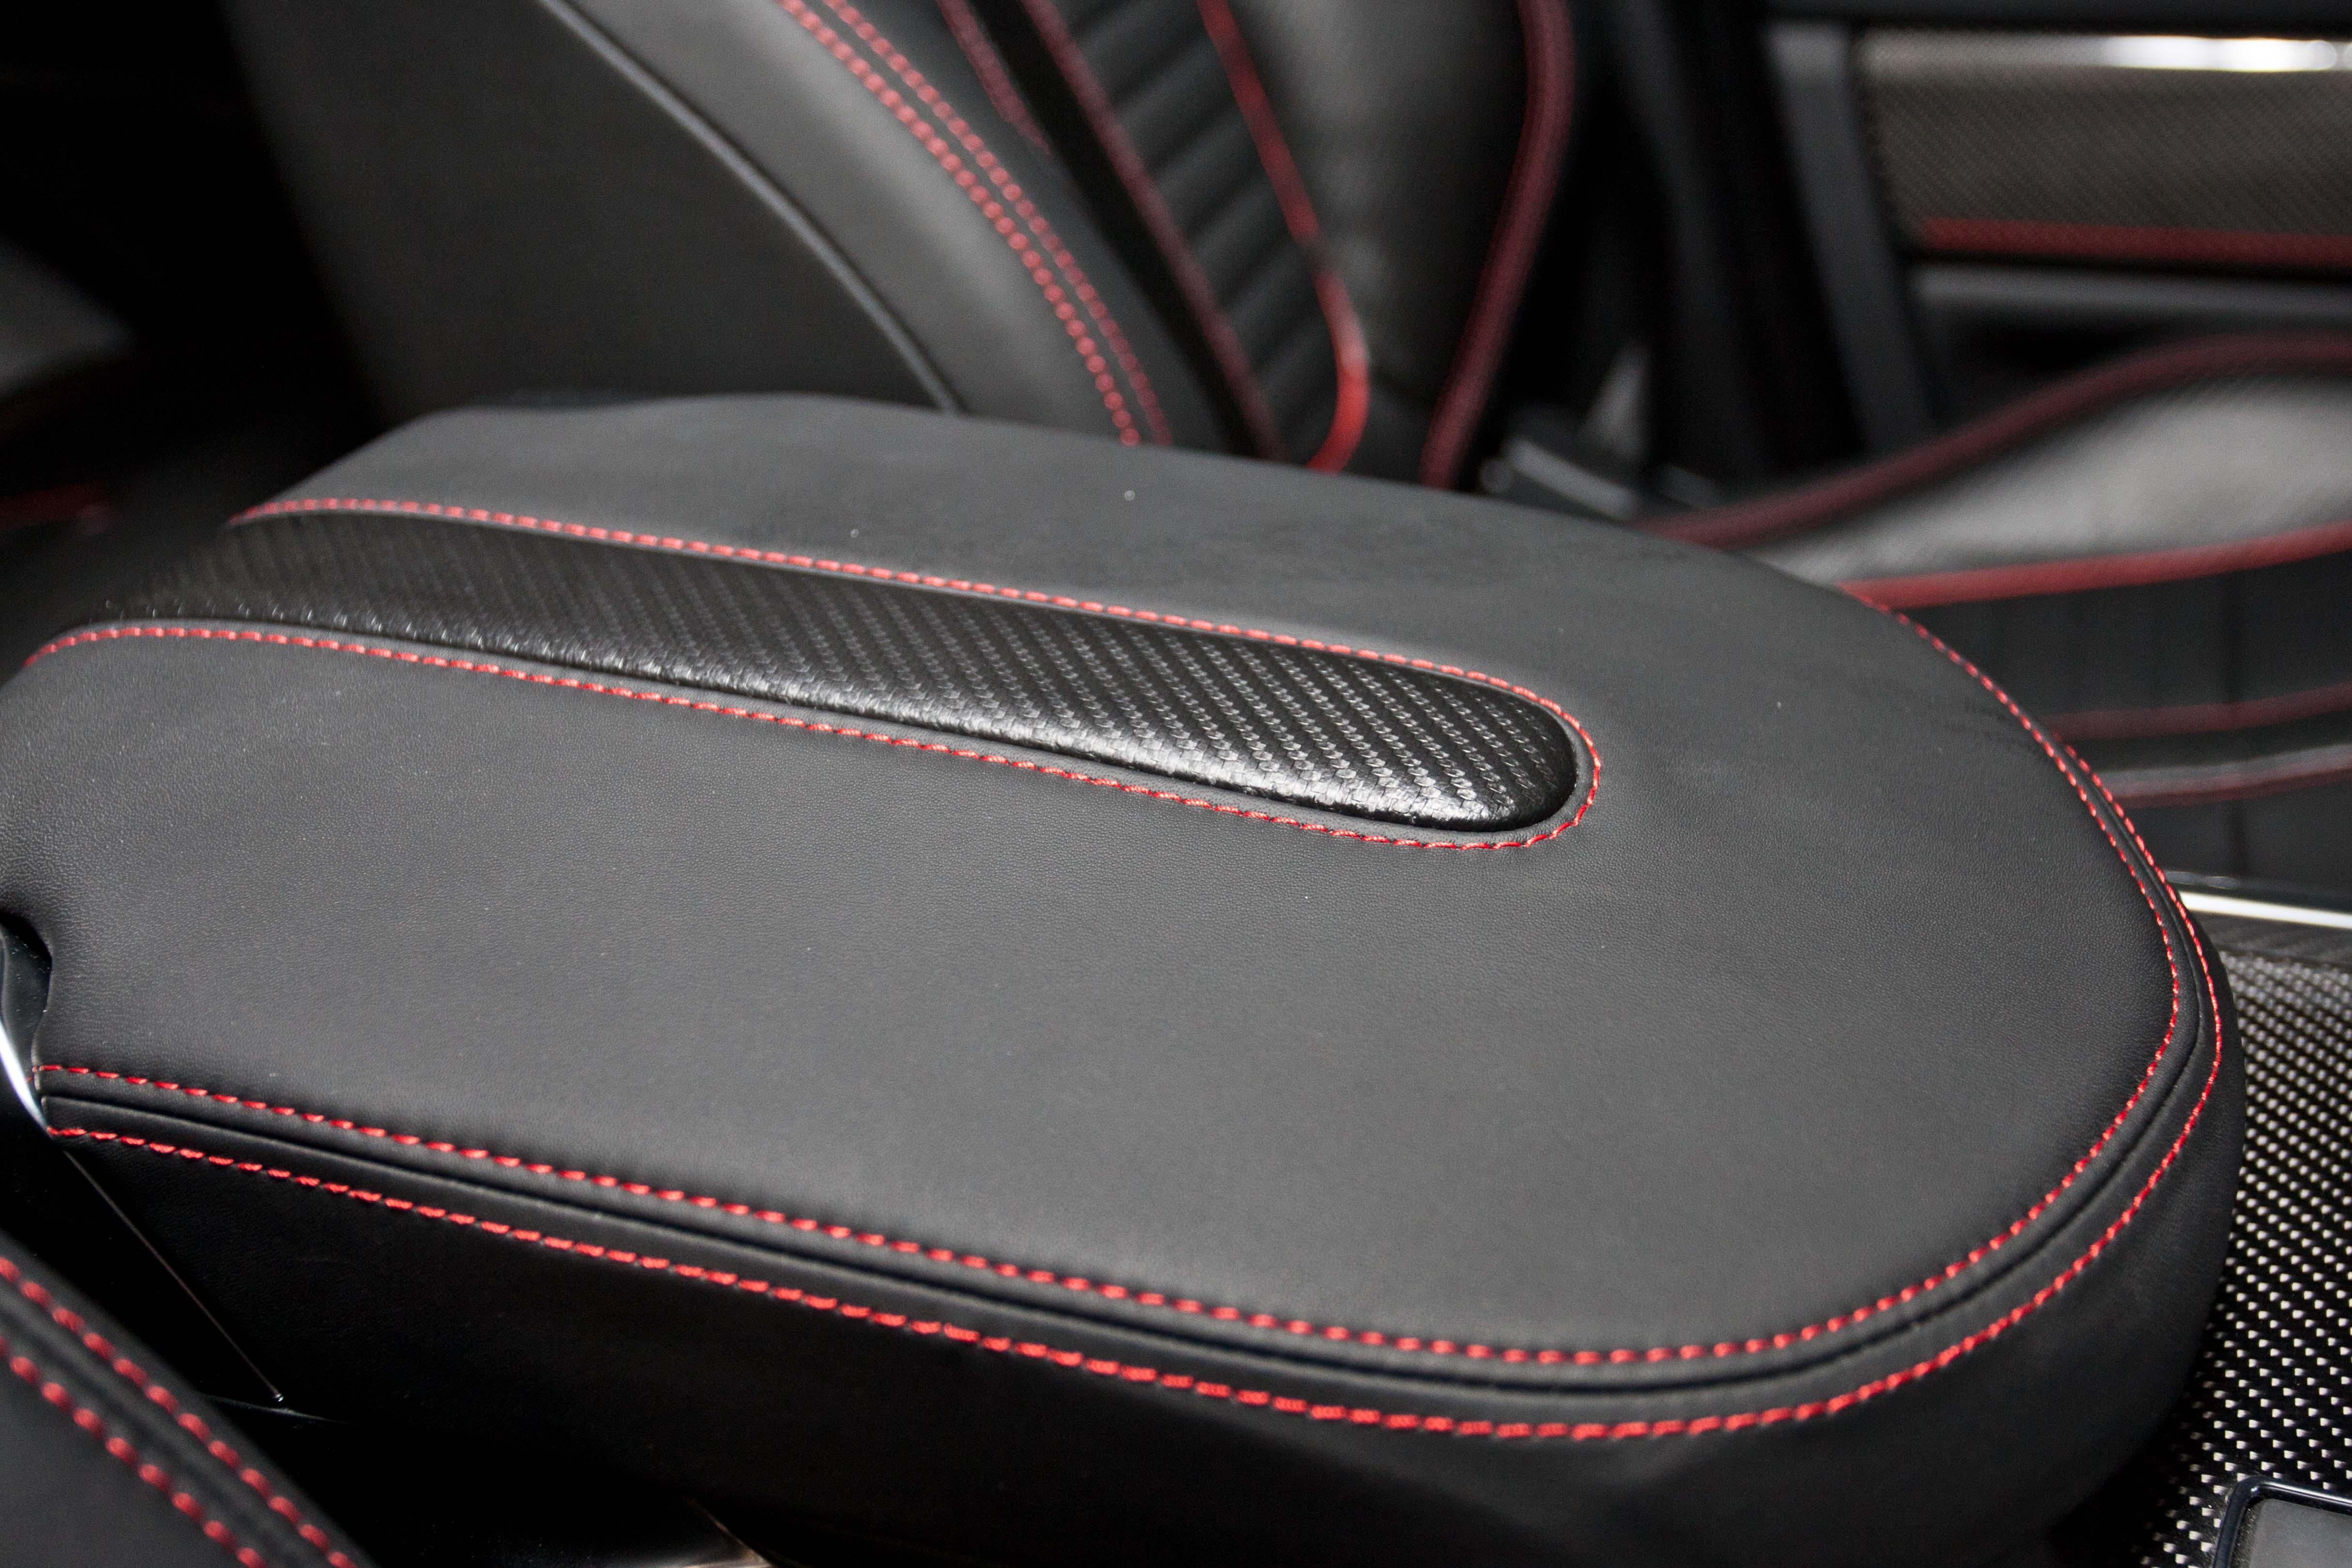 SVR Carbon Bespoke Leather Interior19